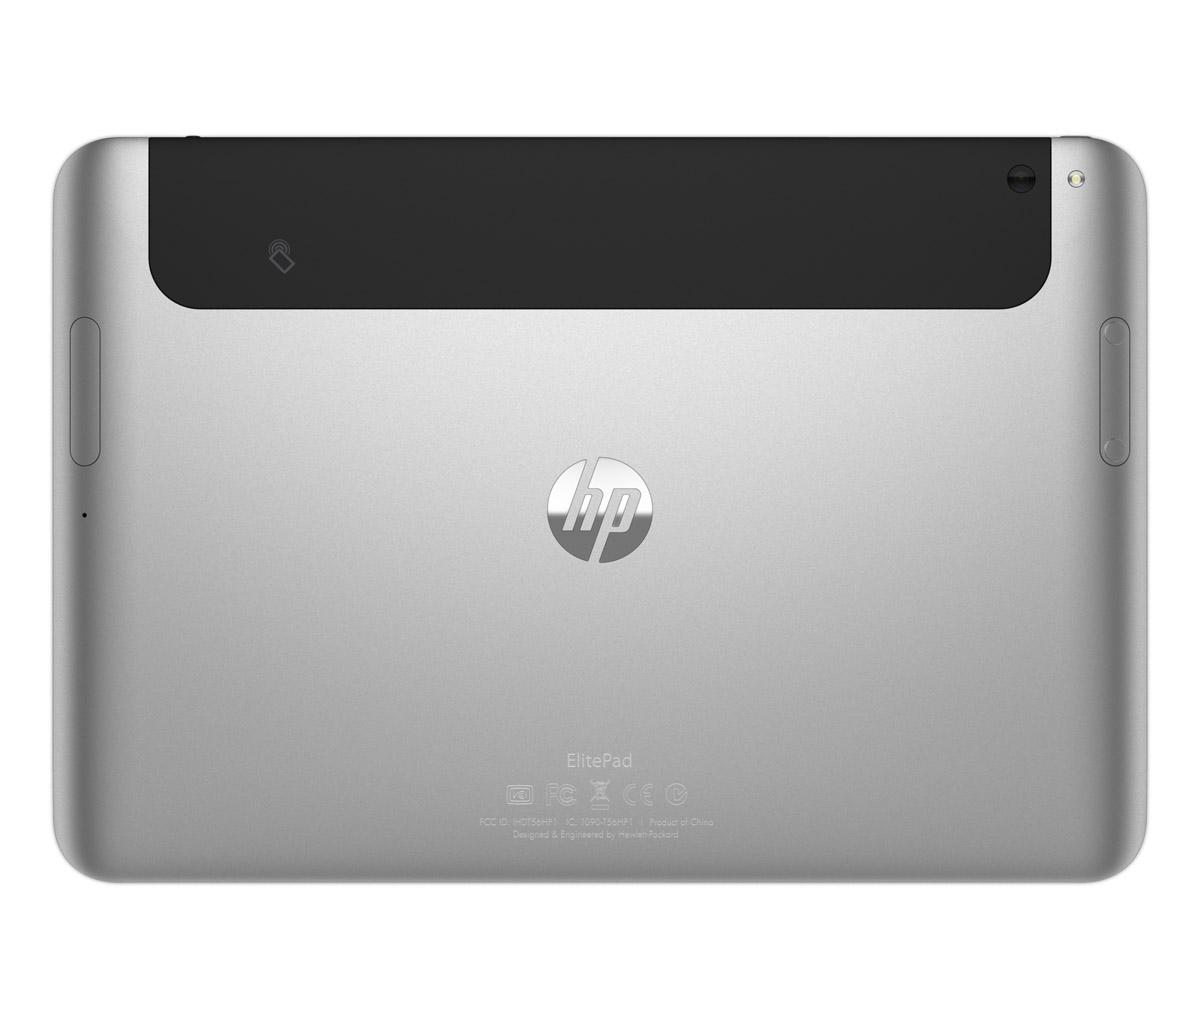 hp-elitepad-900-back-profile